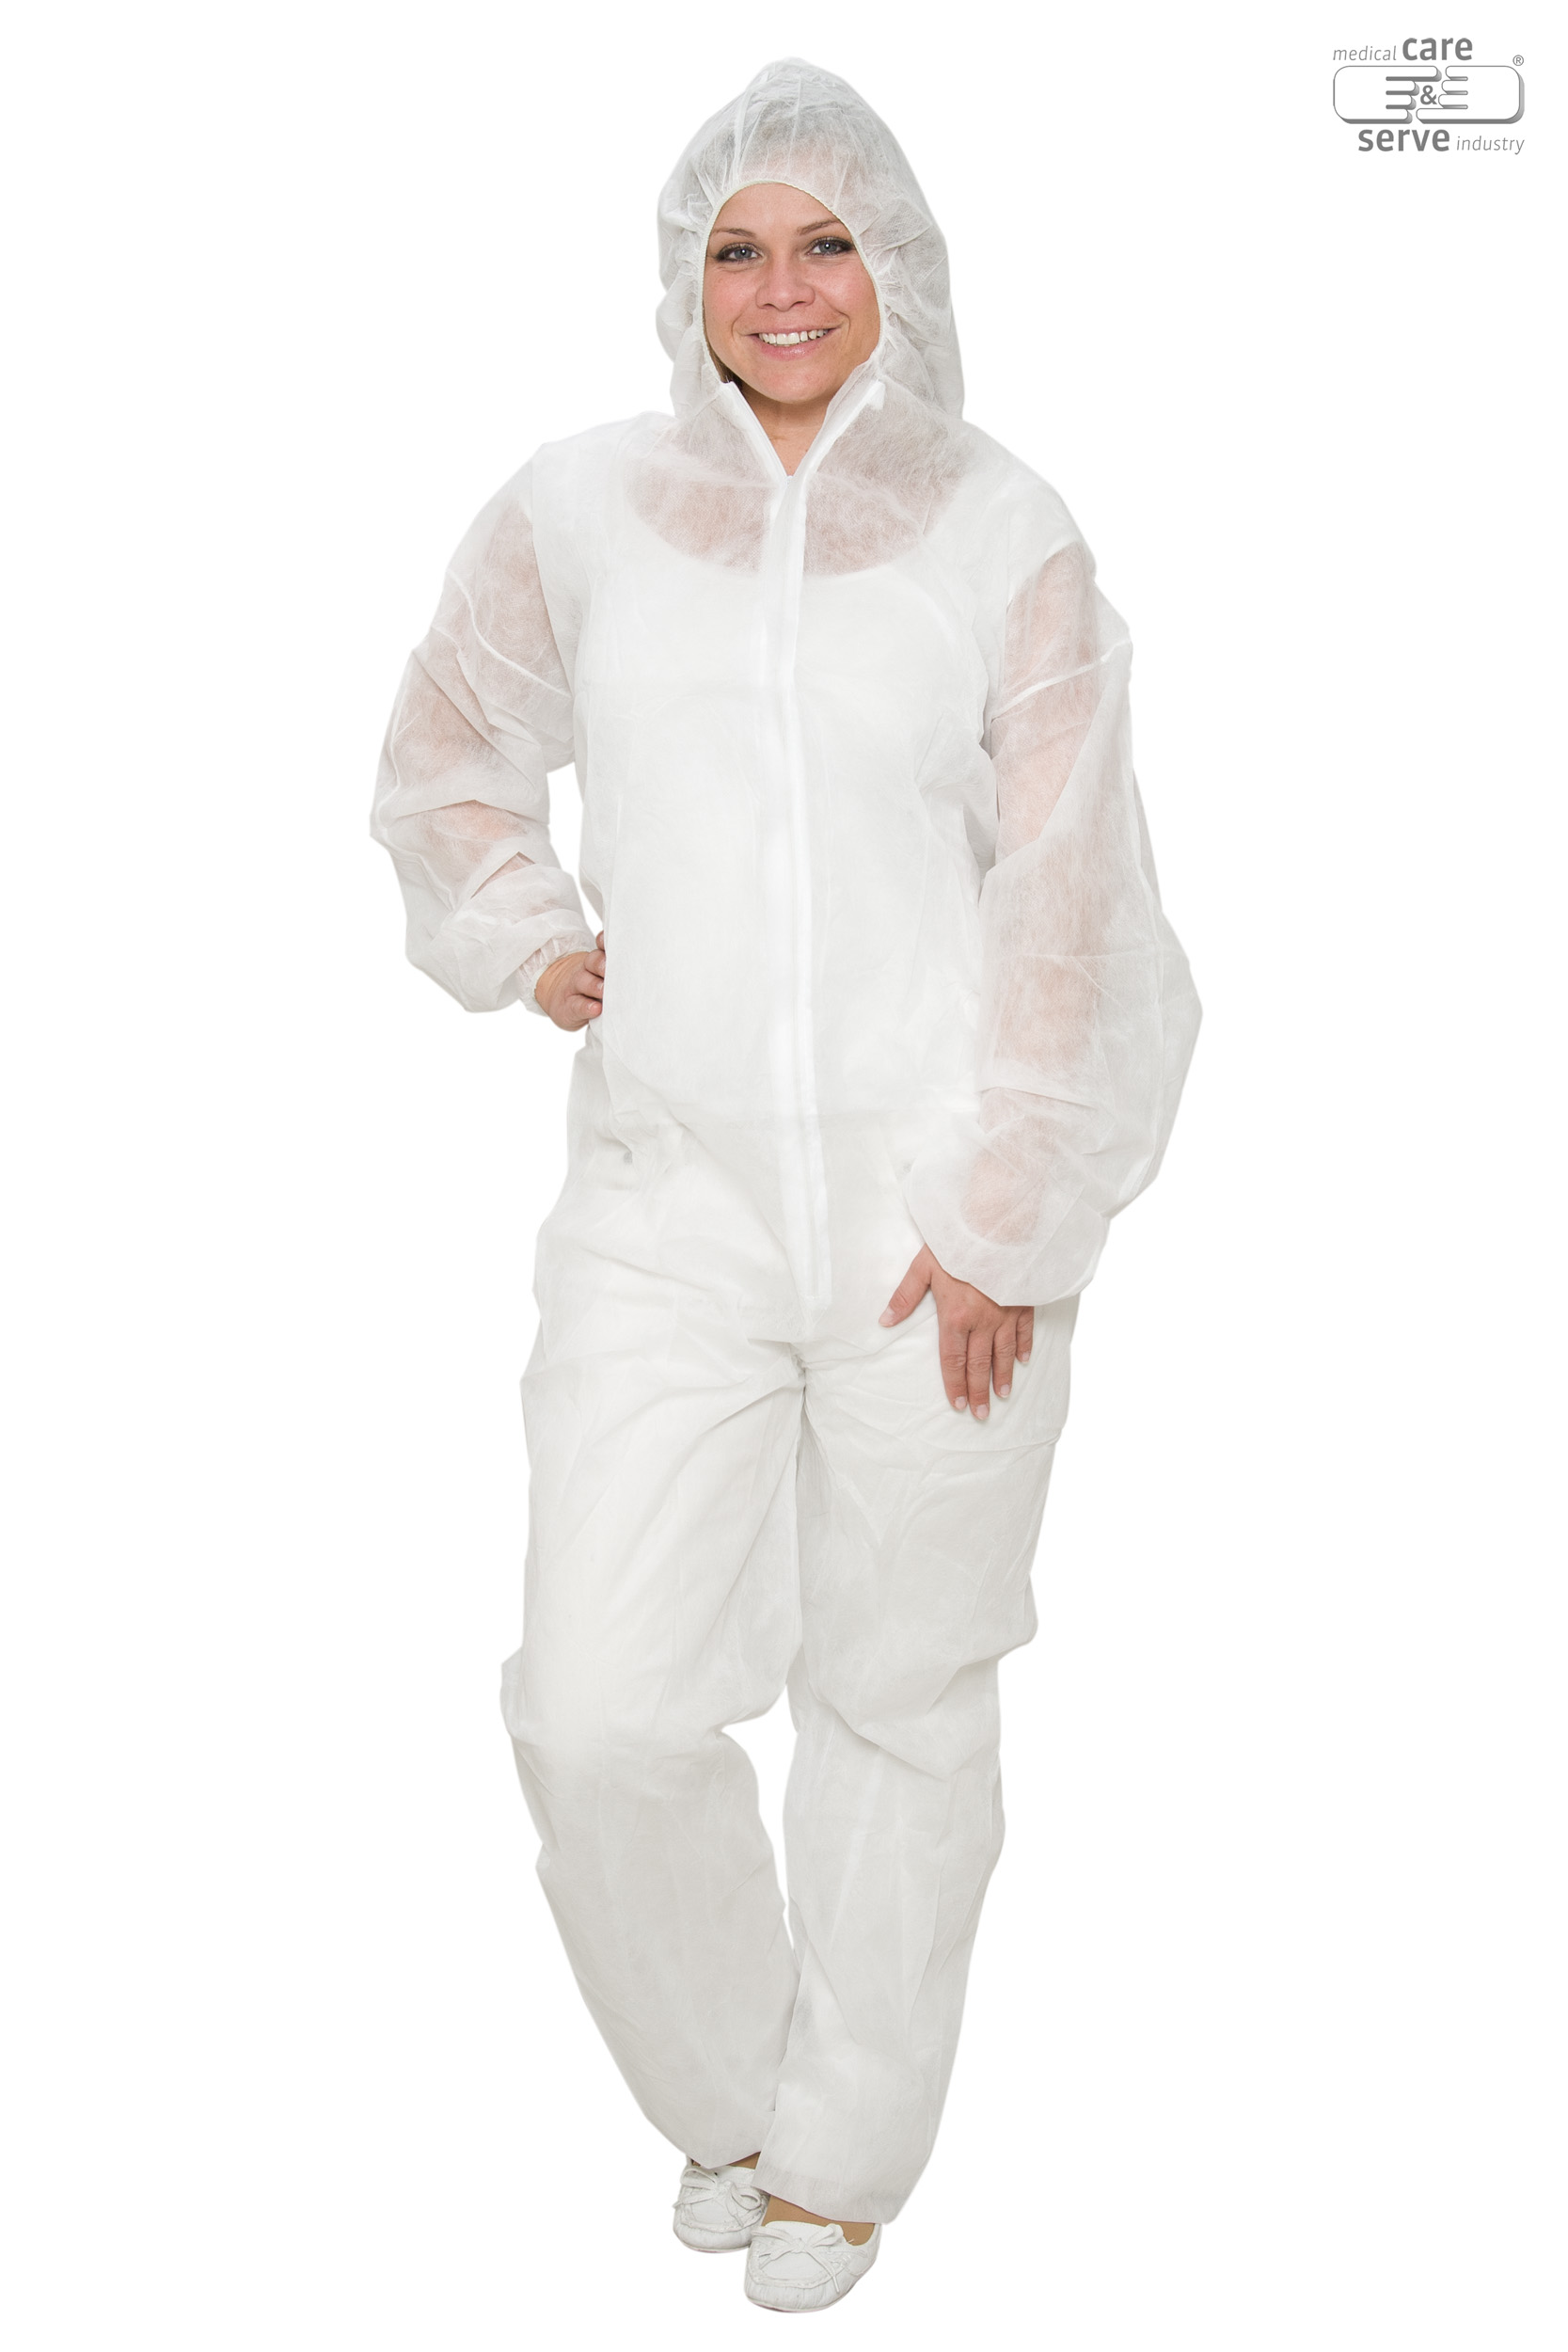 Wiros PP-Einweg-Anzug mit Kapuze